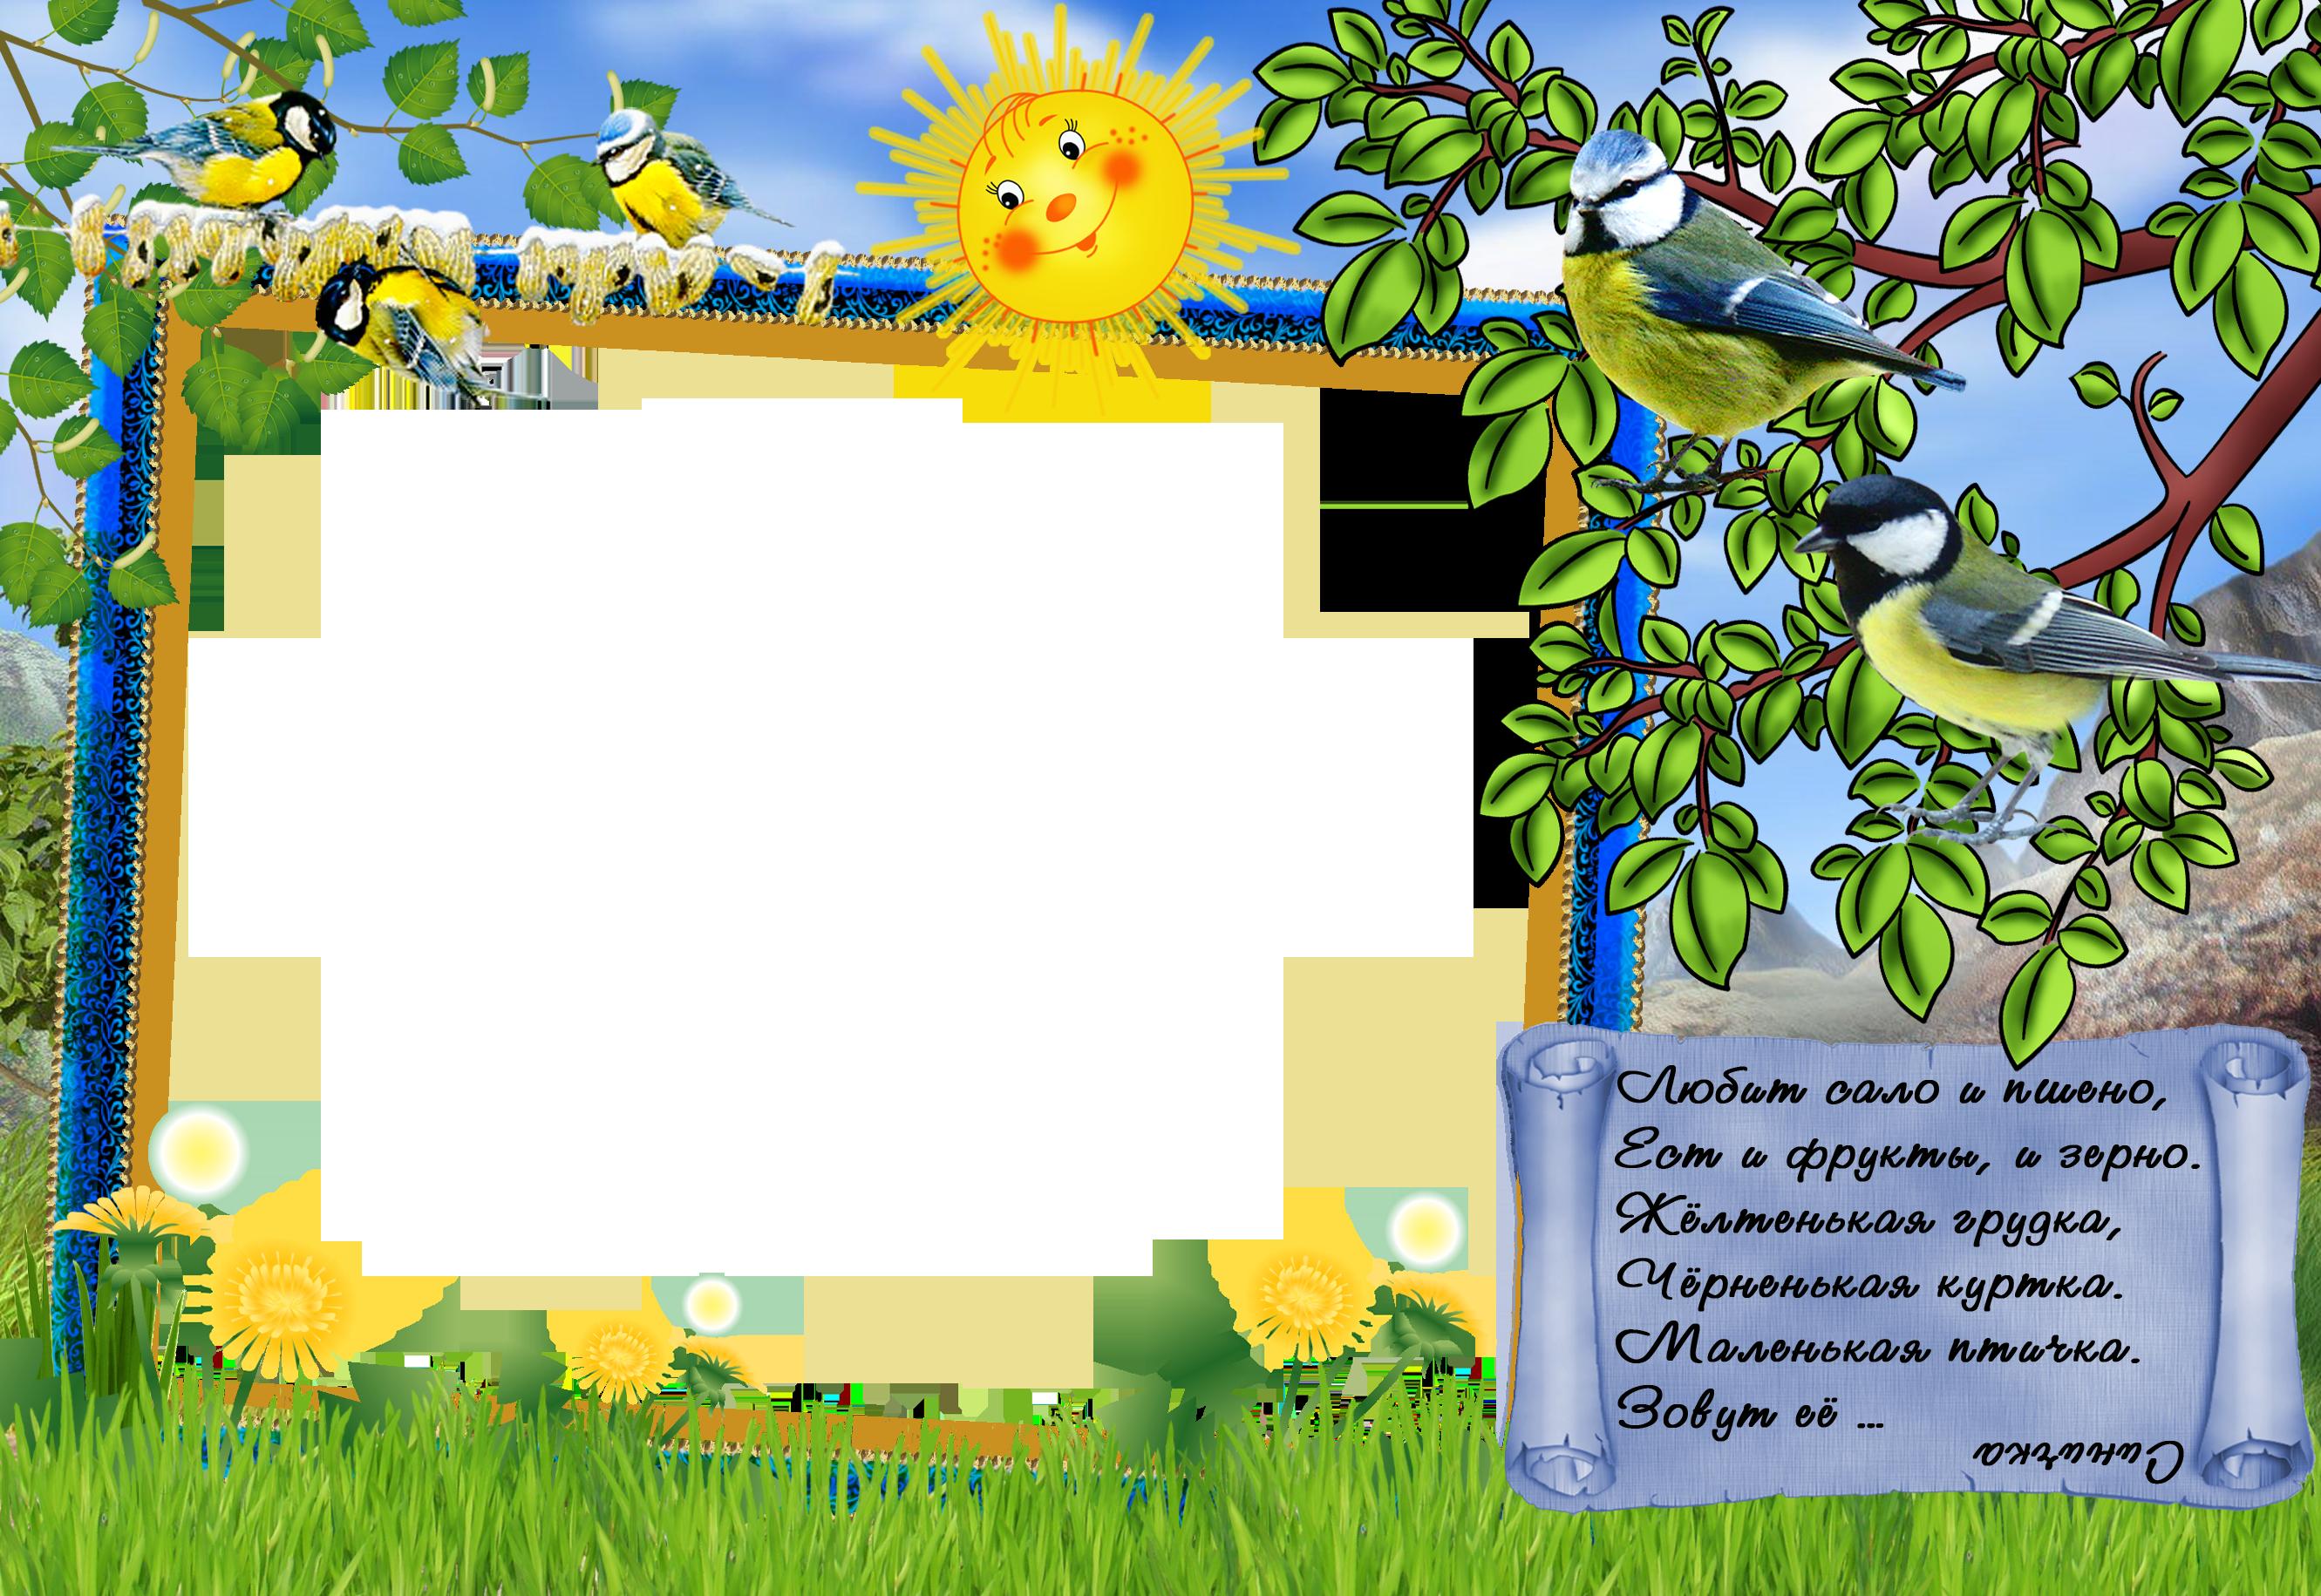 Детские фото рамки - Загадки : Синичка: http://detochki.su/index.php?option=com_content&id=1020:2010-04-27-10-34-42&Itemid=284